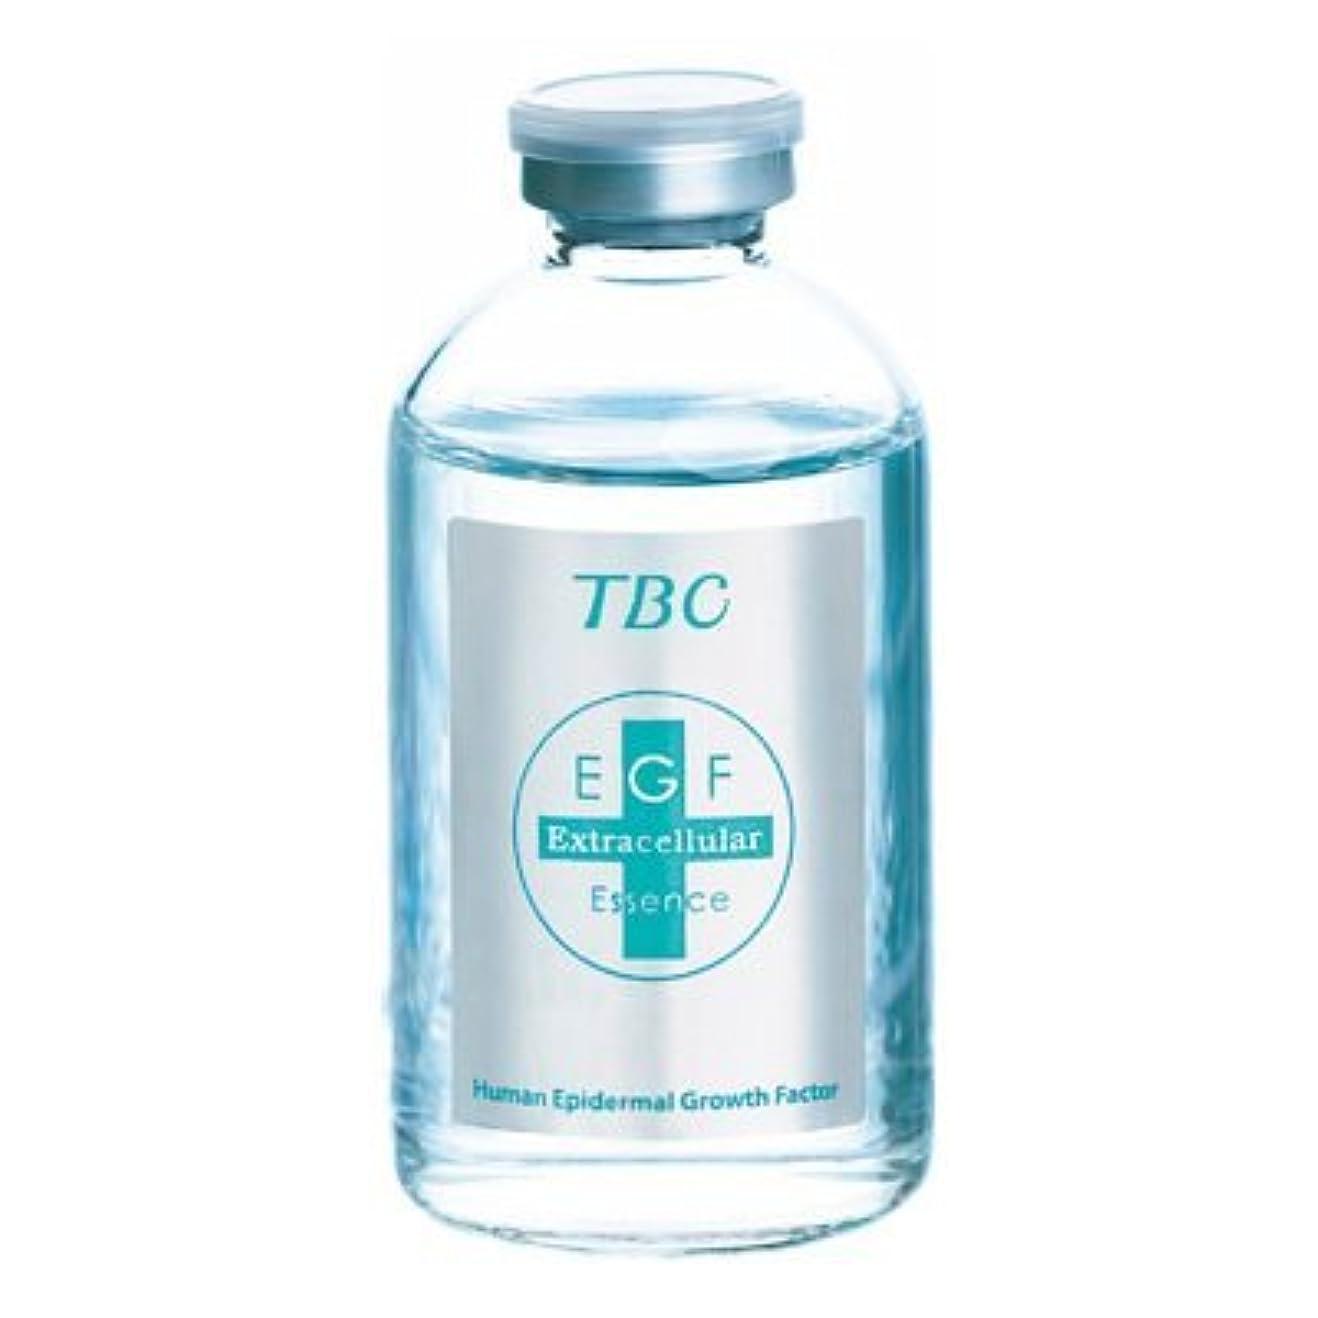 TBC EGF エクストラエッセンス 60ml [並行輸入品]